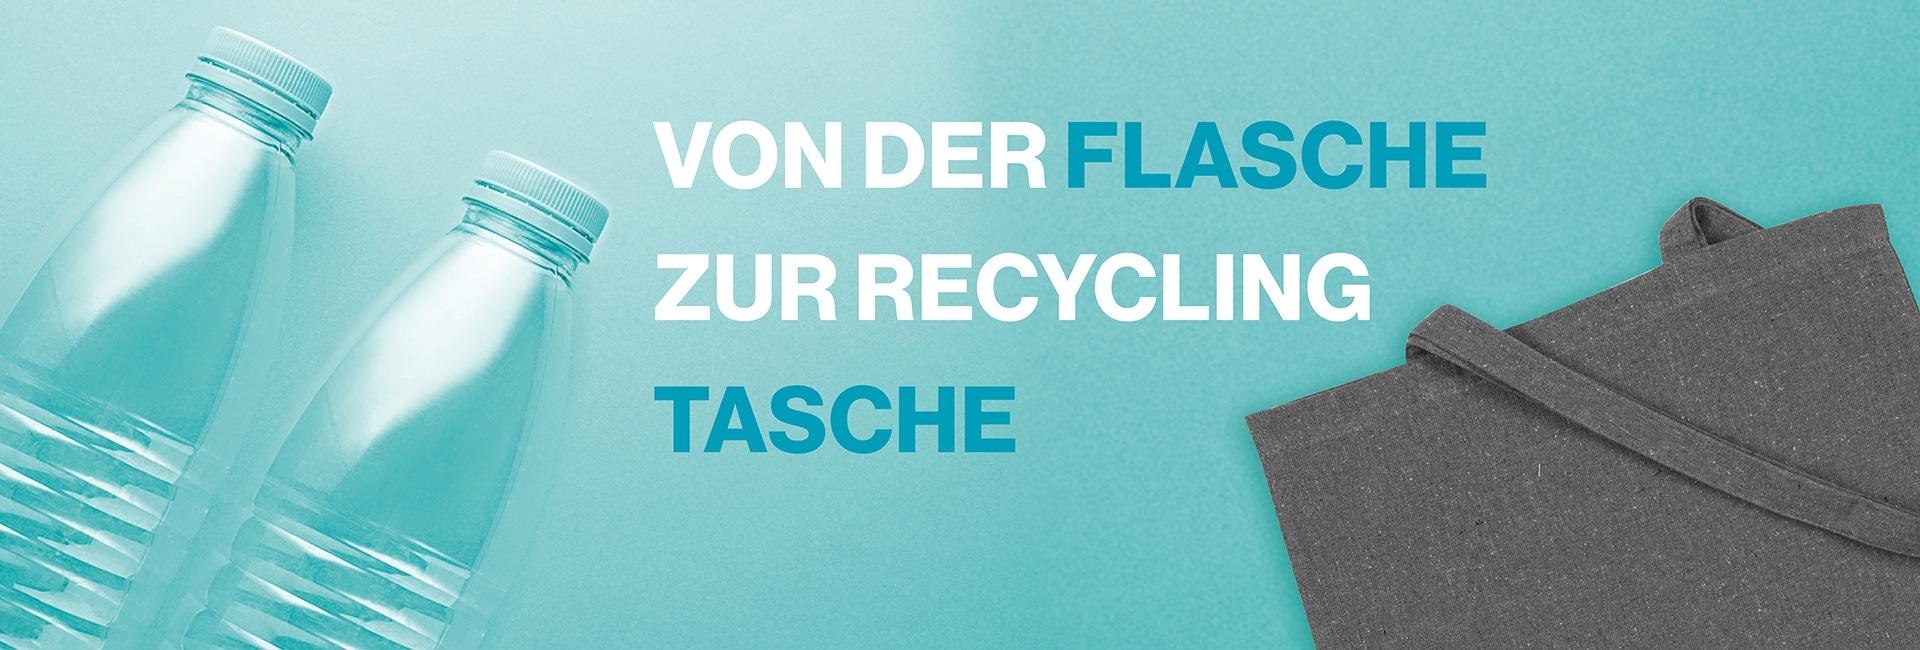 Recycling Tasche Renata